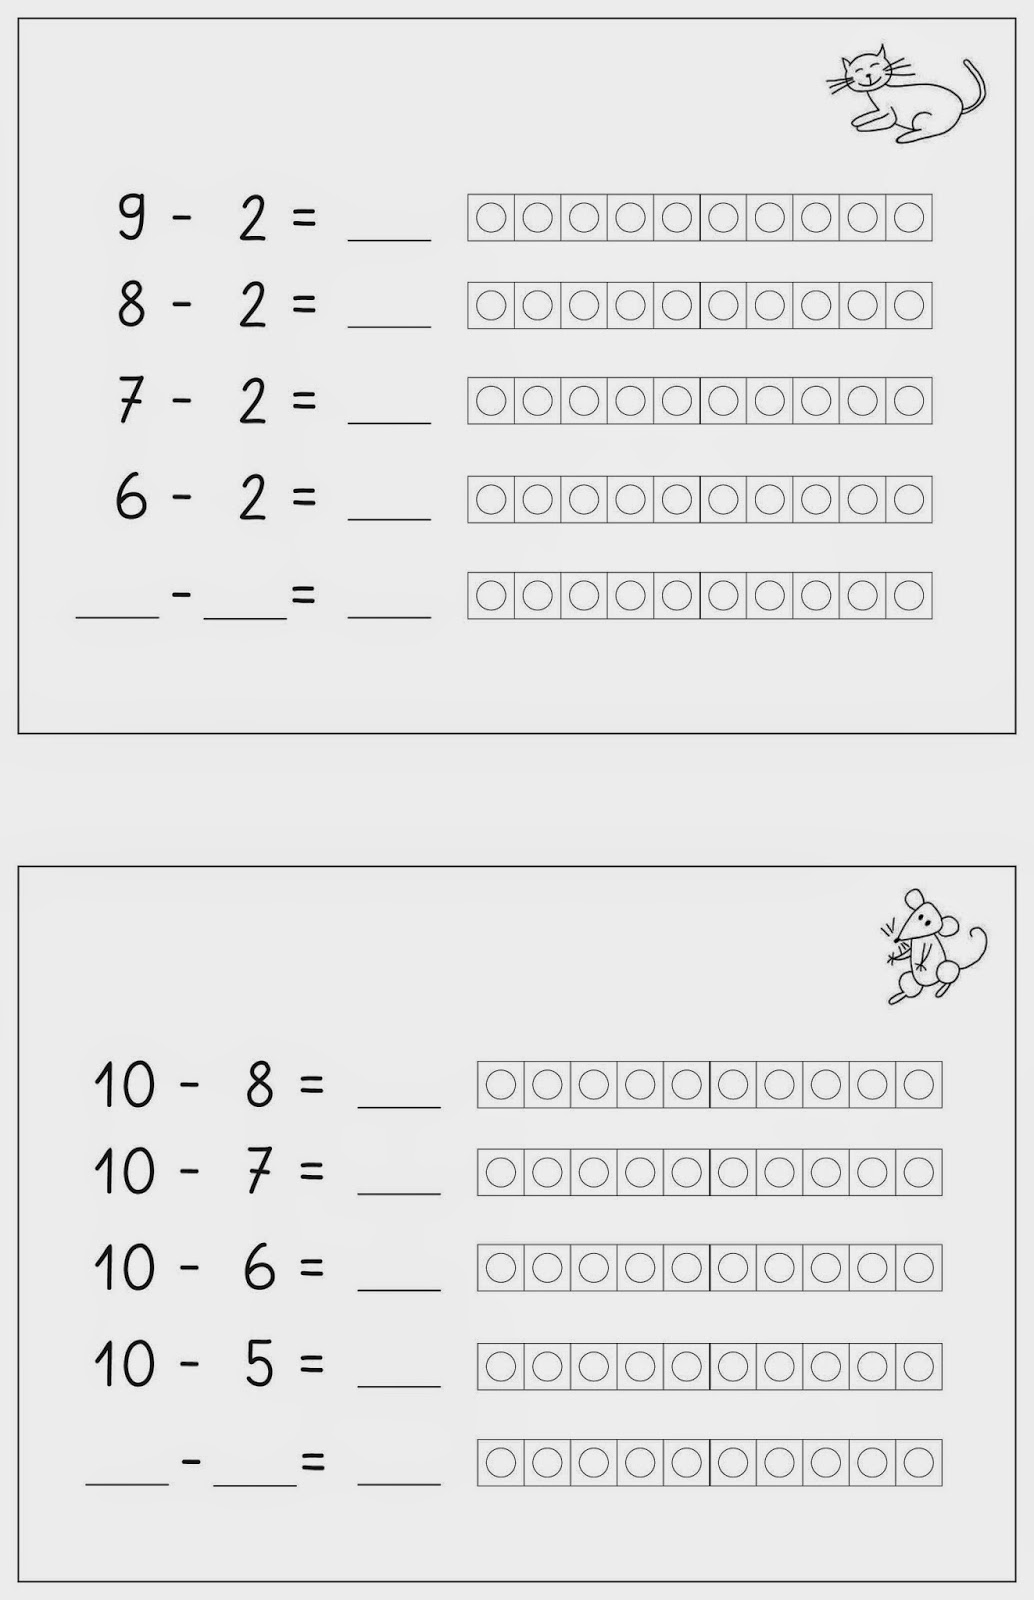 Umkehraufgaben 2 klasse